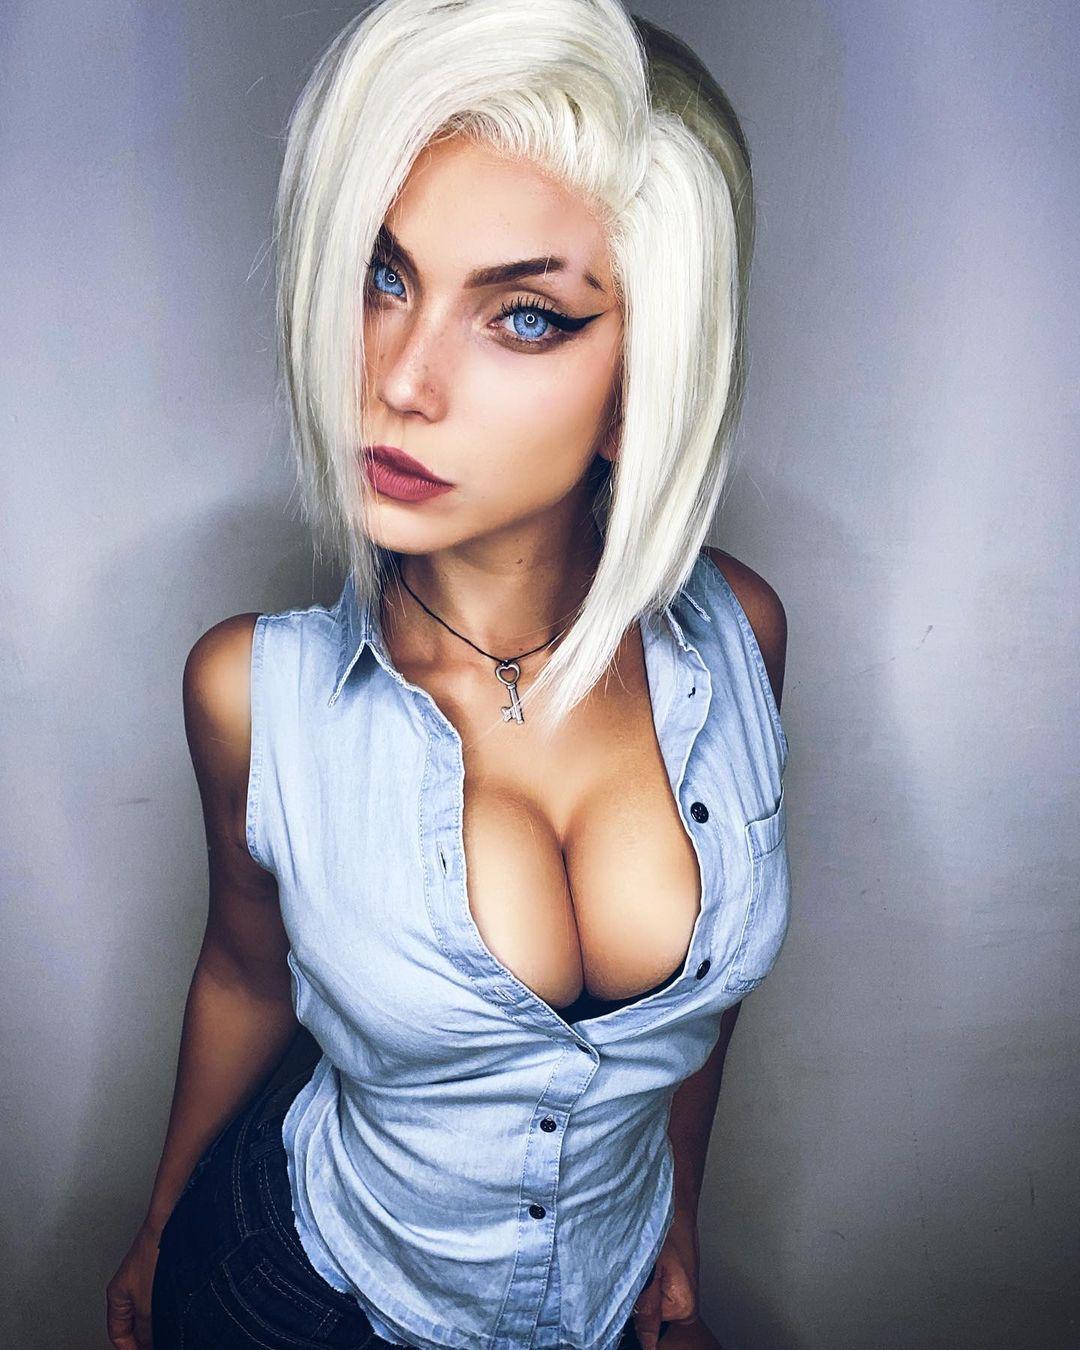 Android 18 By Eugenia Haruno Bellomia @soryu_geggy_cosplay